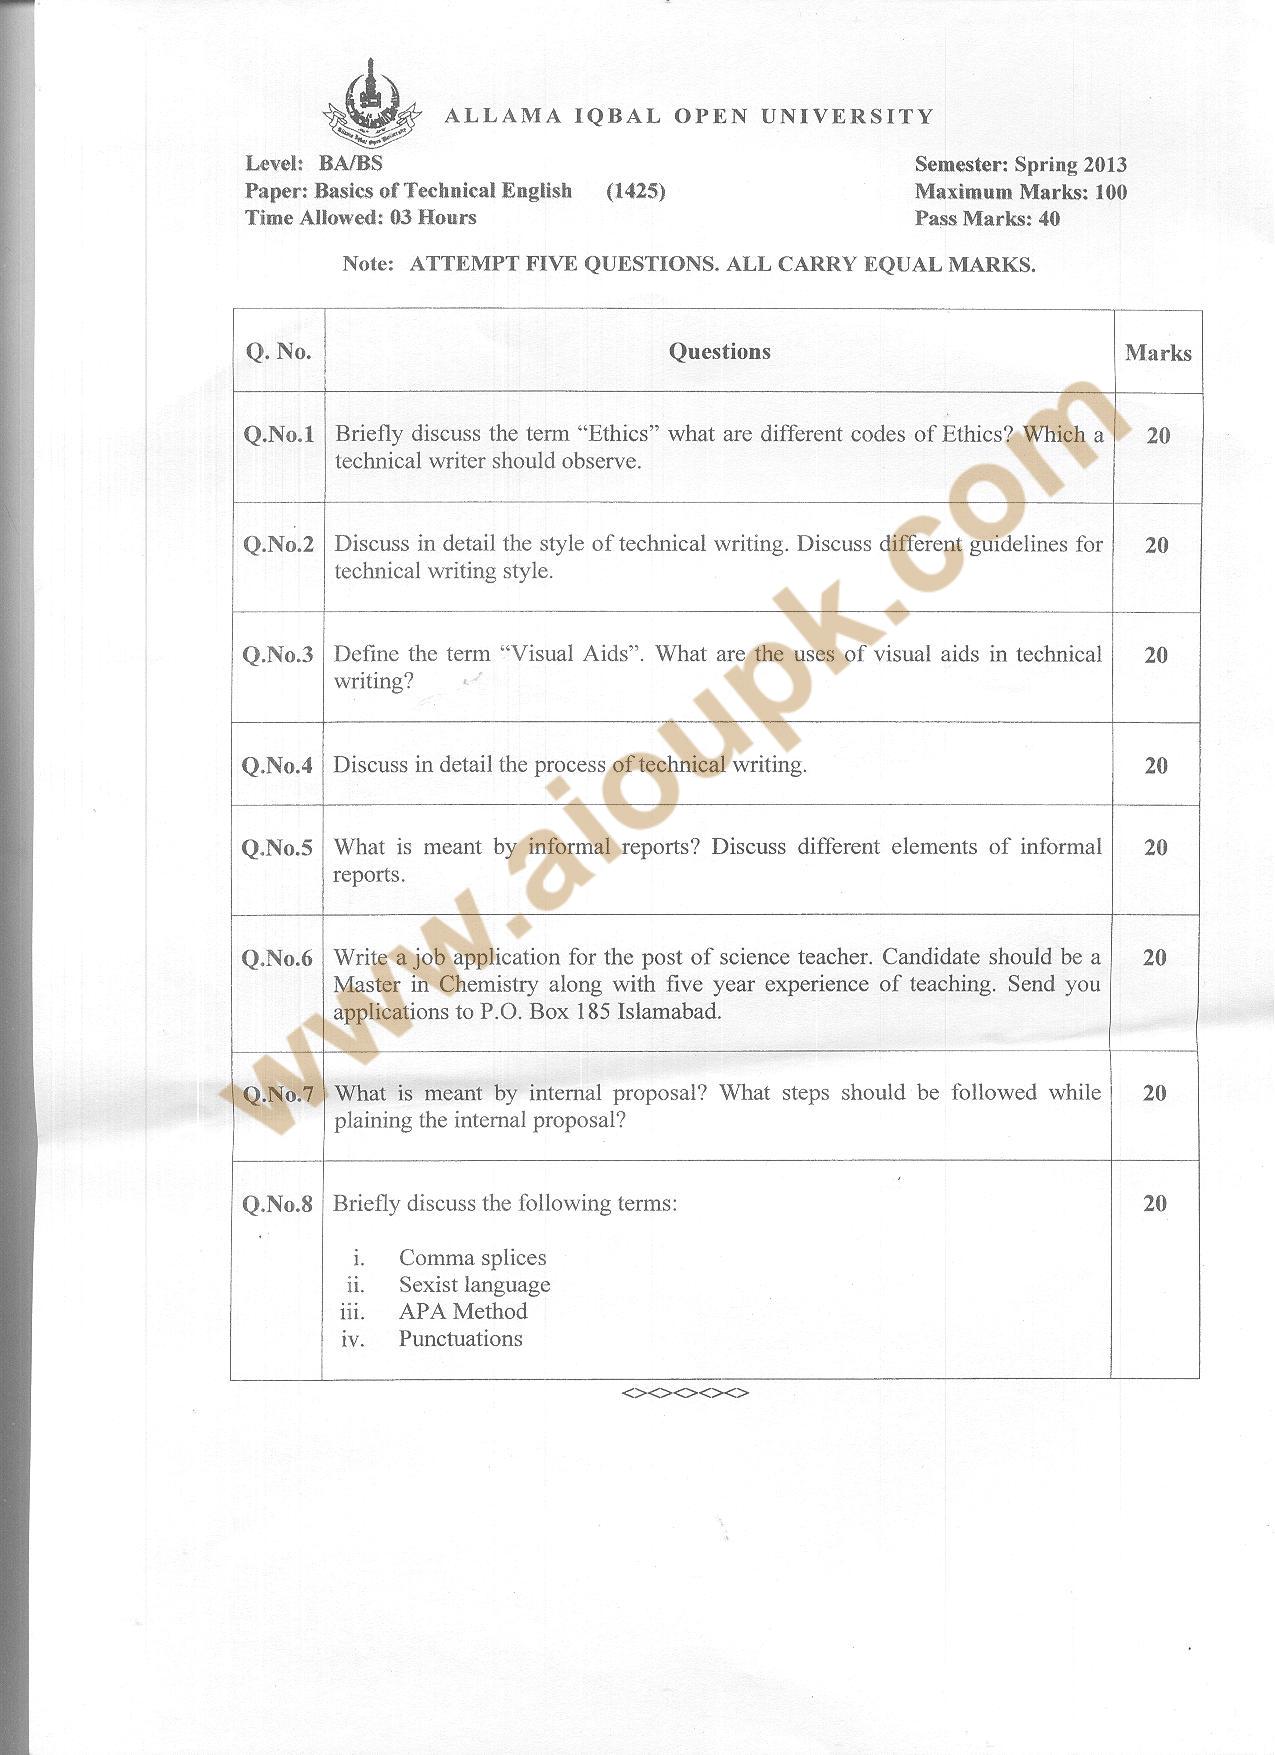 Code Aiou Old Paper Basics Of Technical English Writing English Iii Ba Spring